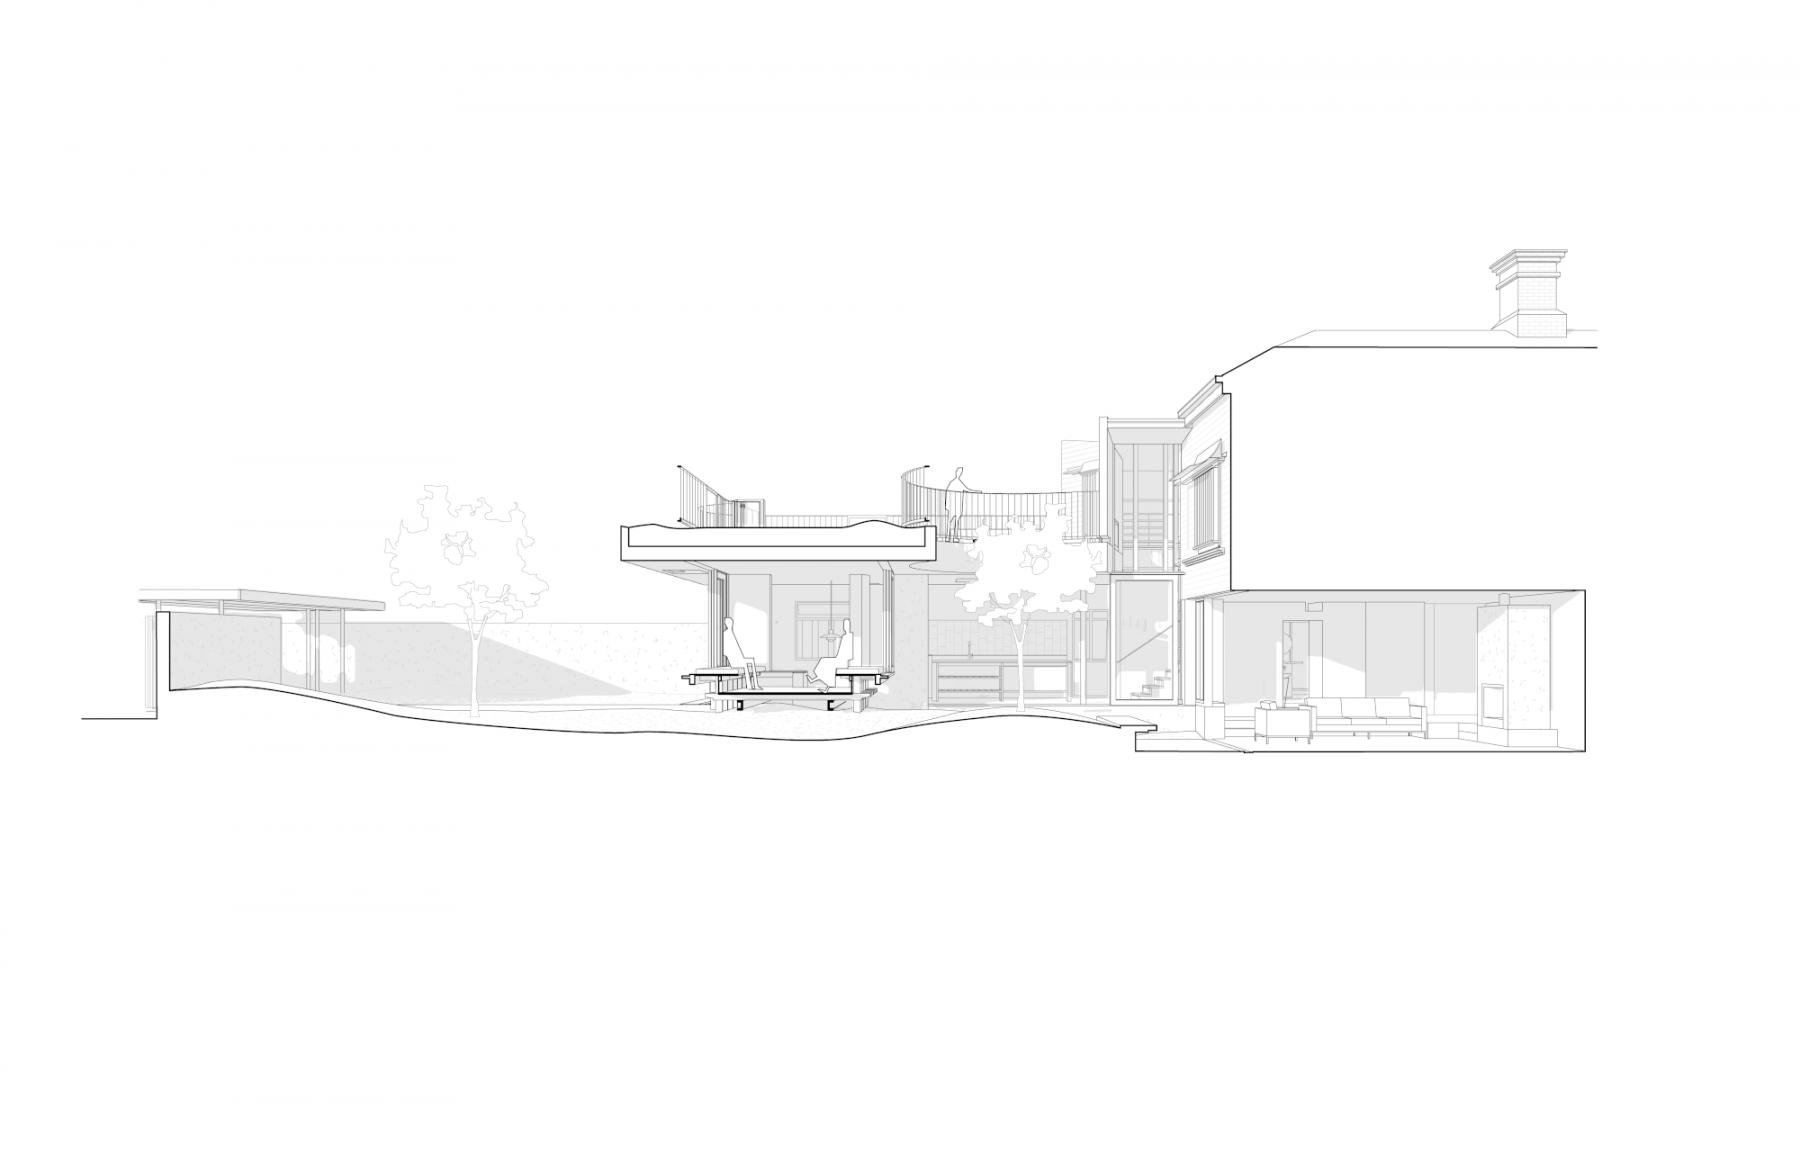 Cavill Architects — Gibbon St